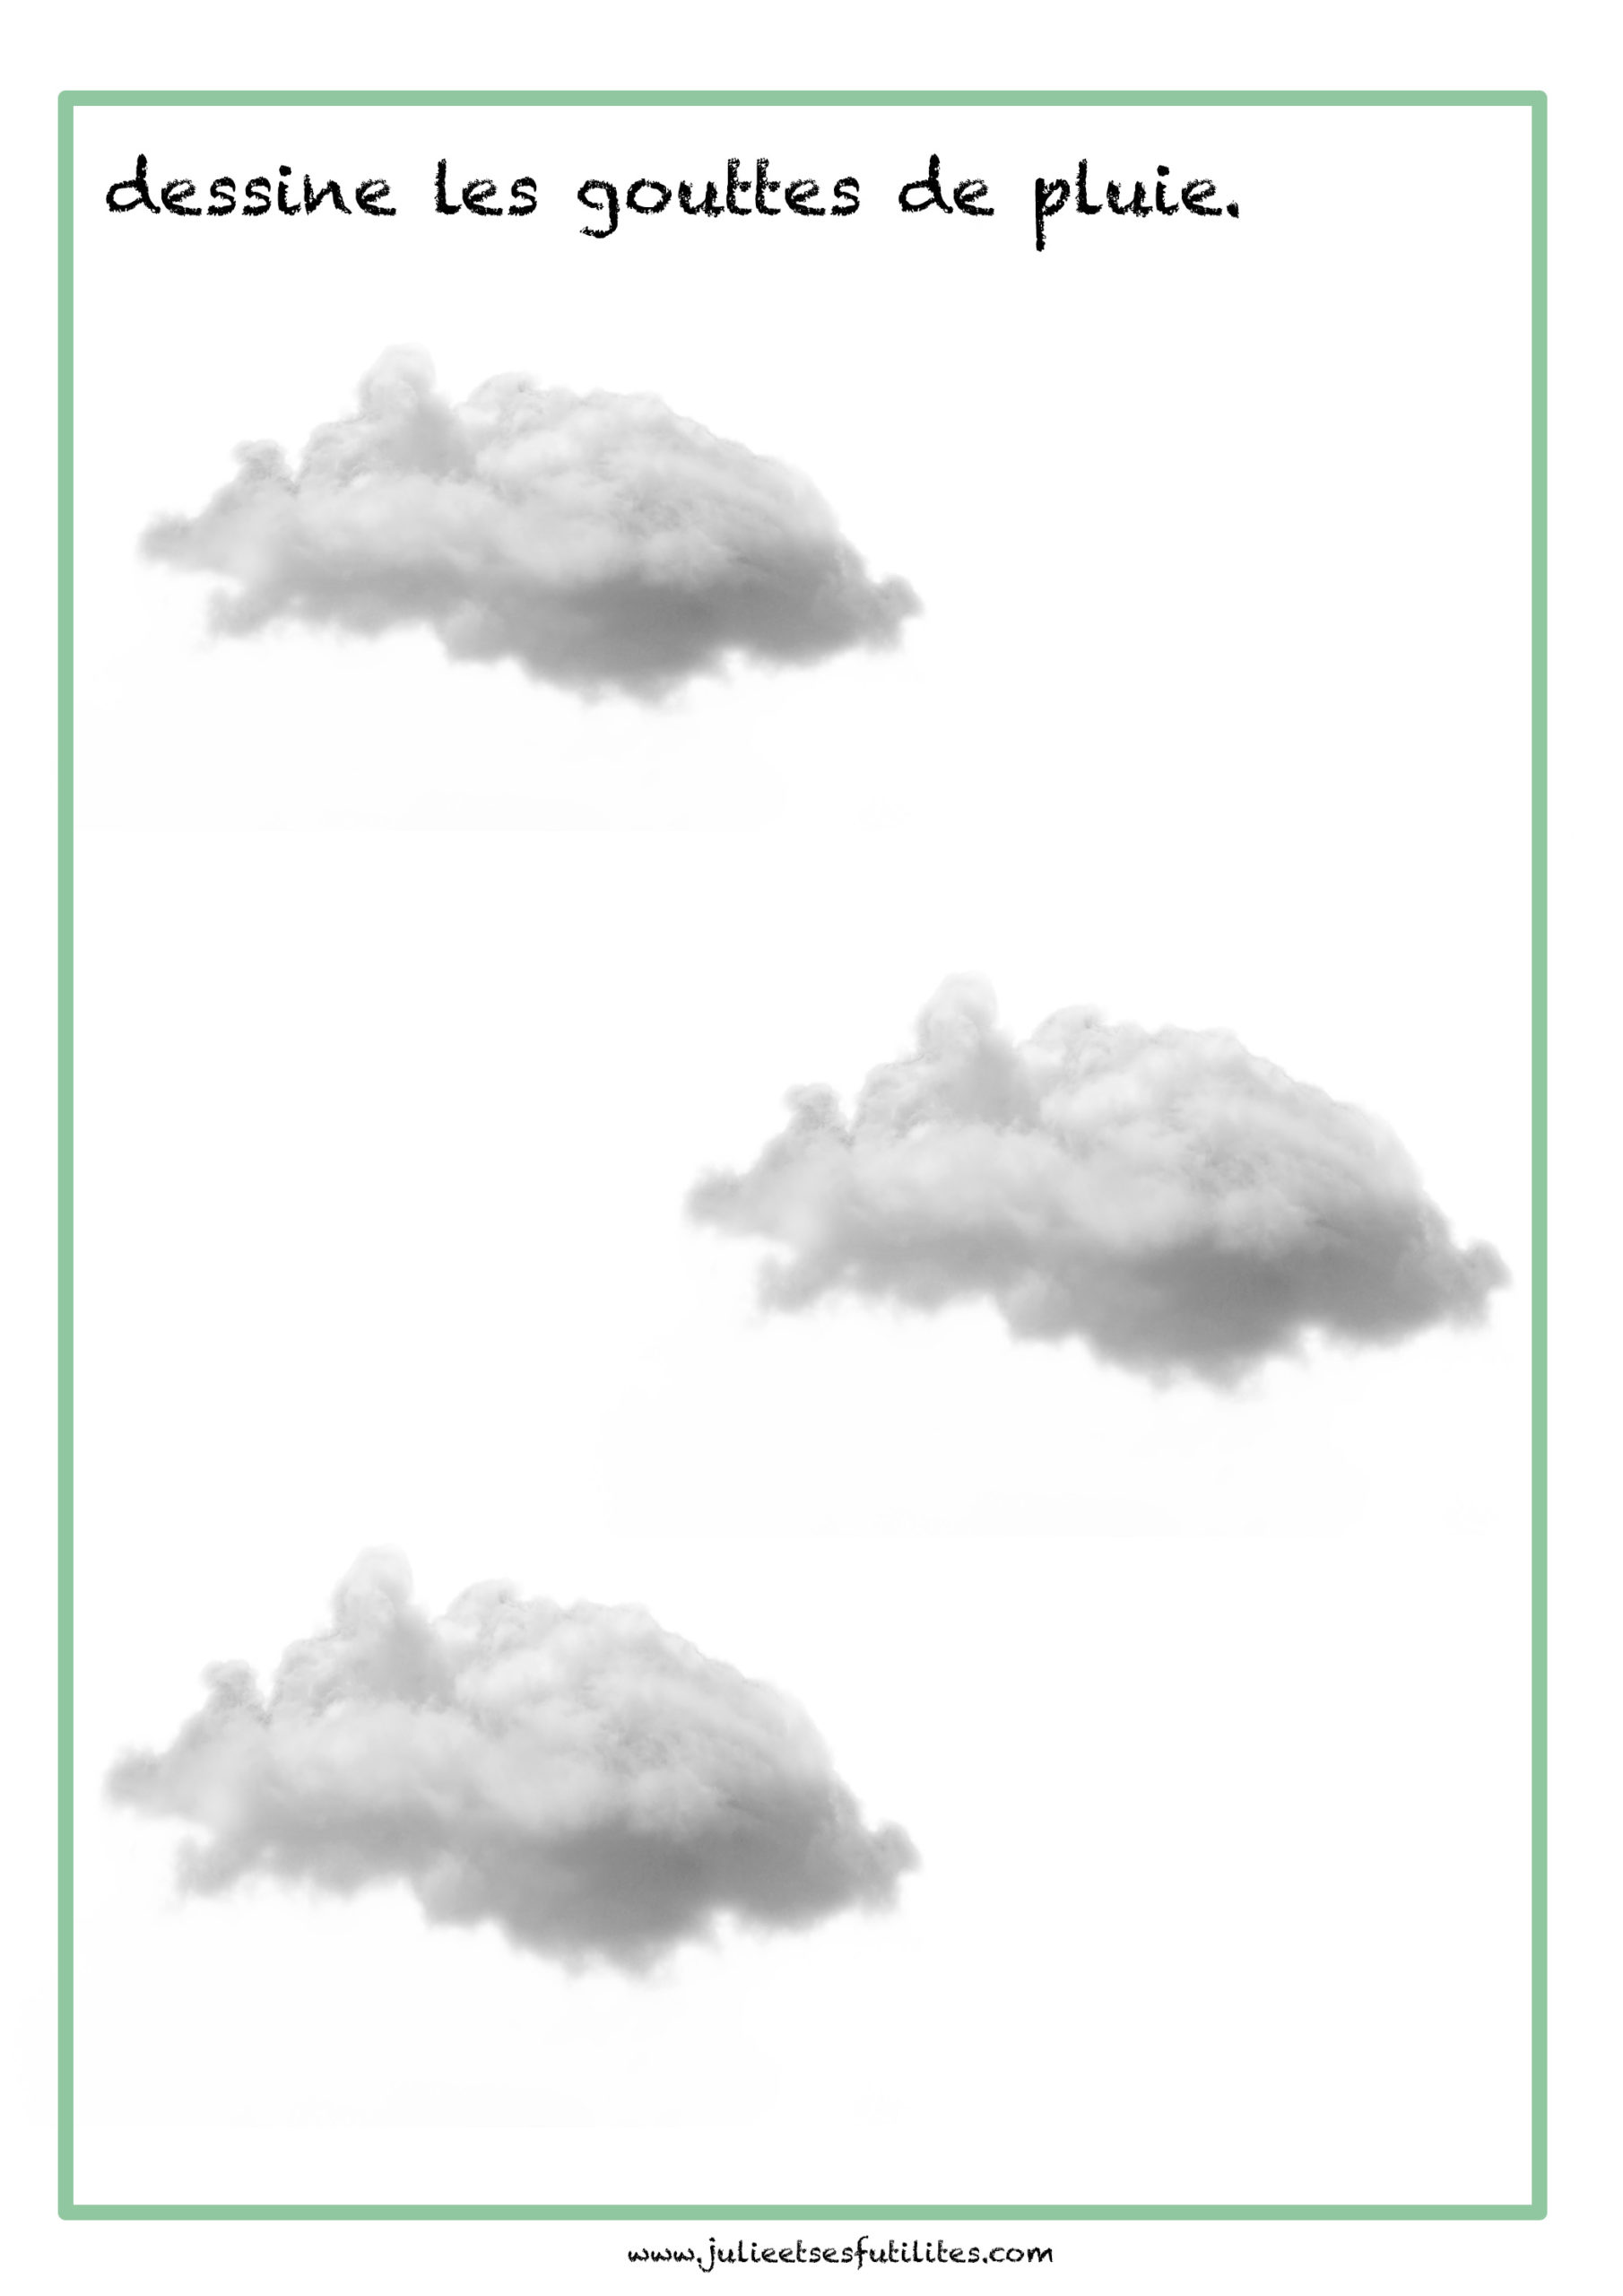 exercice-pluie